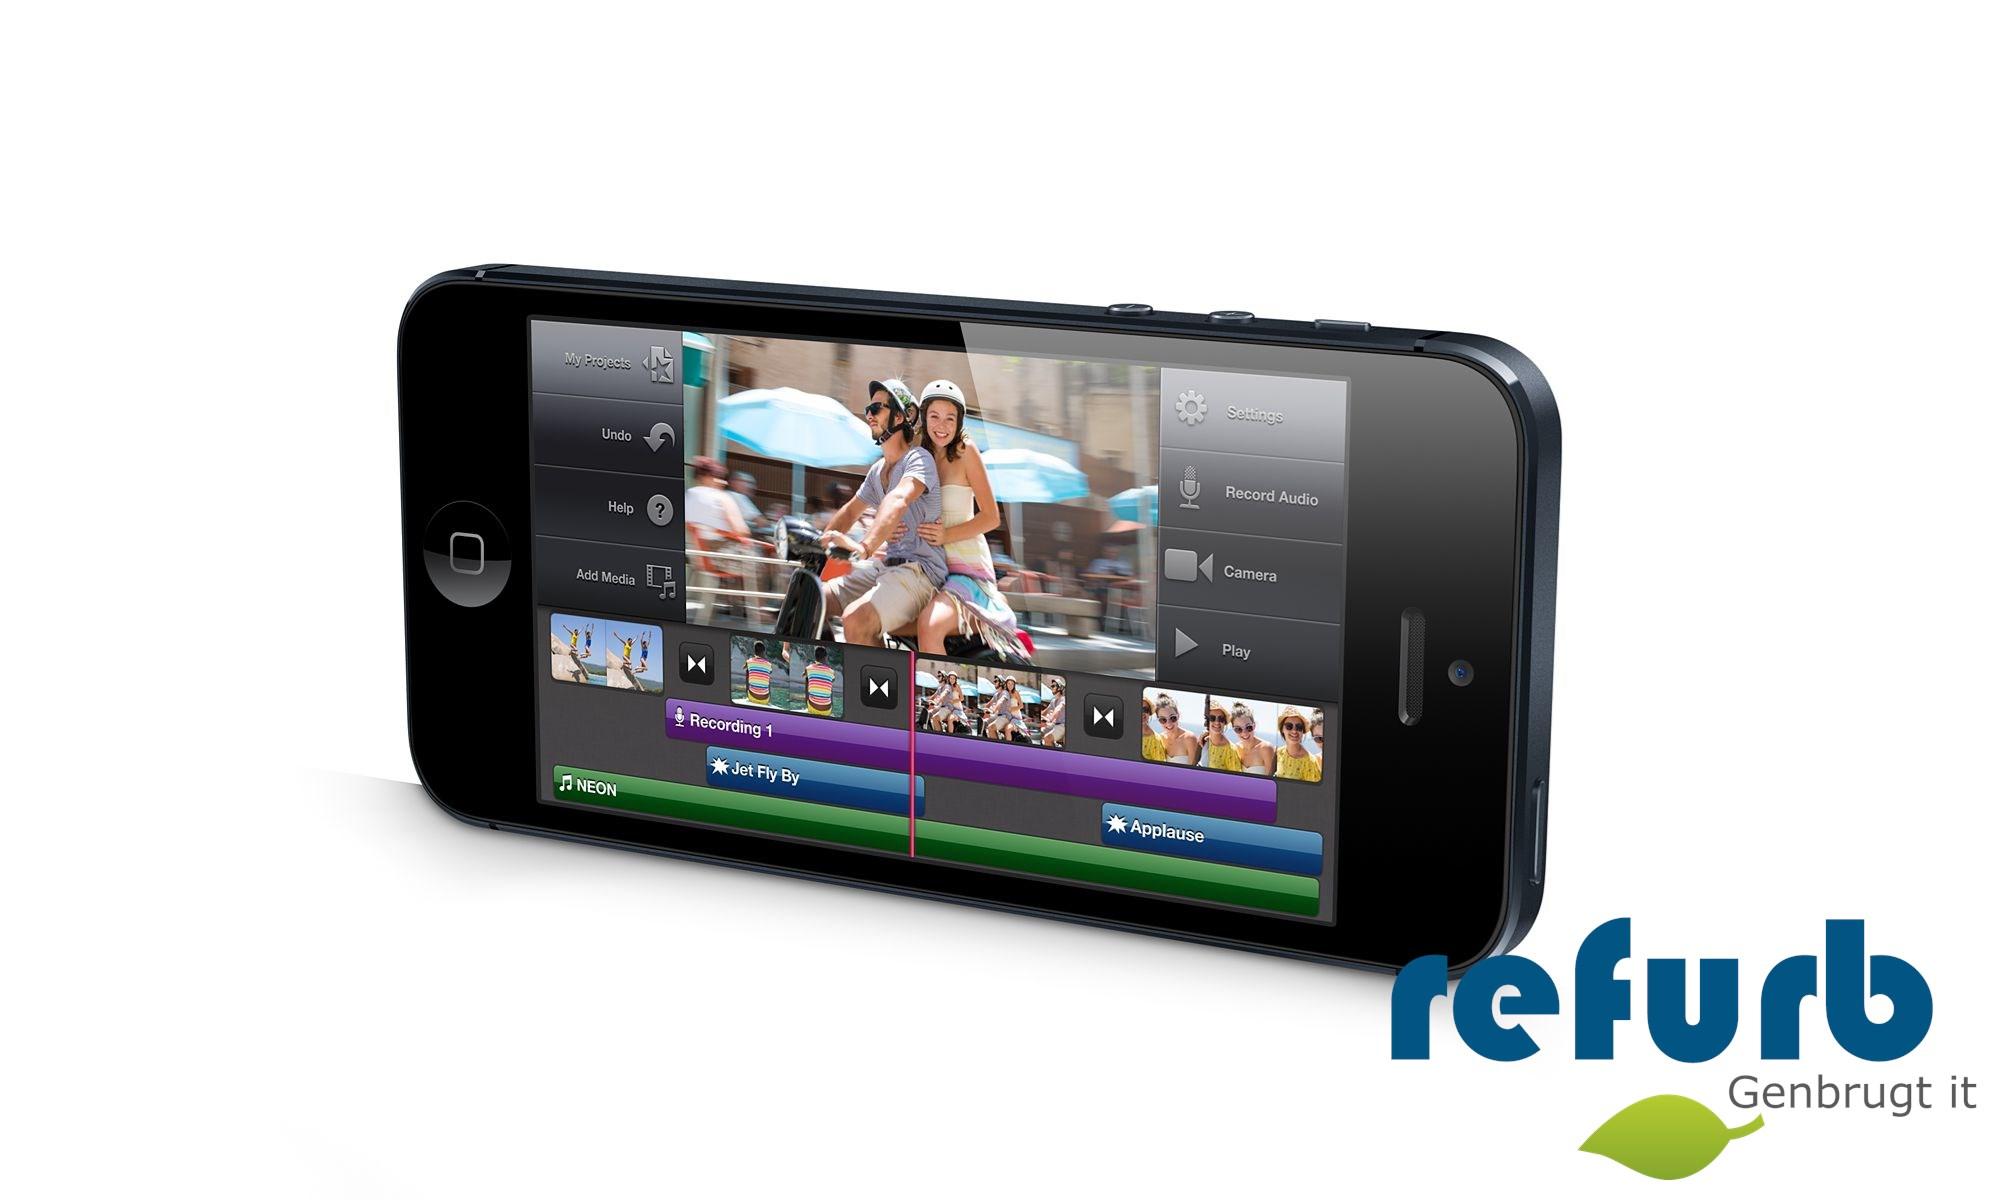 billig iphone 5 skärm